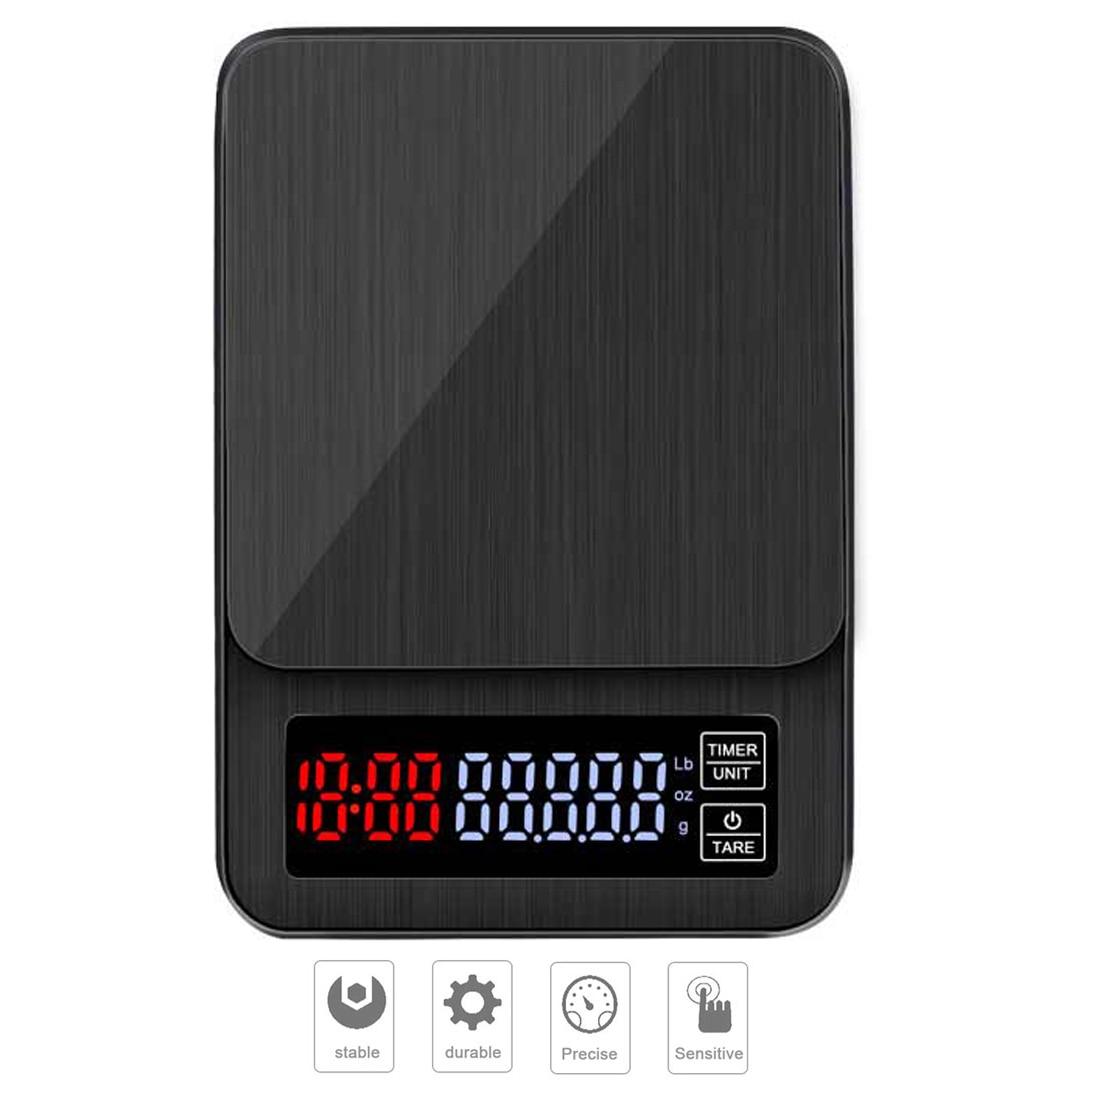 3/5/10kg 1g דיגיטלי מזון מטבח בקנה מידה תכשיטי דיוק אלקטרוני בקנה מידה איזון נירוסטה פלטפורמה עם LCD תצוגה